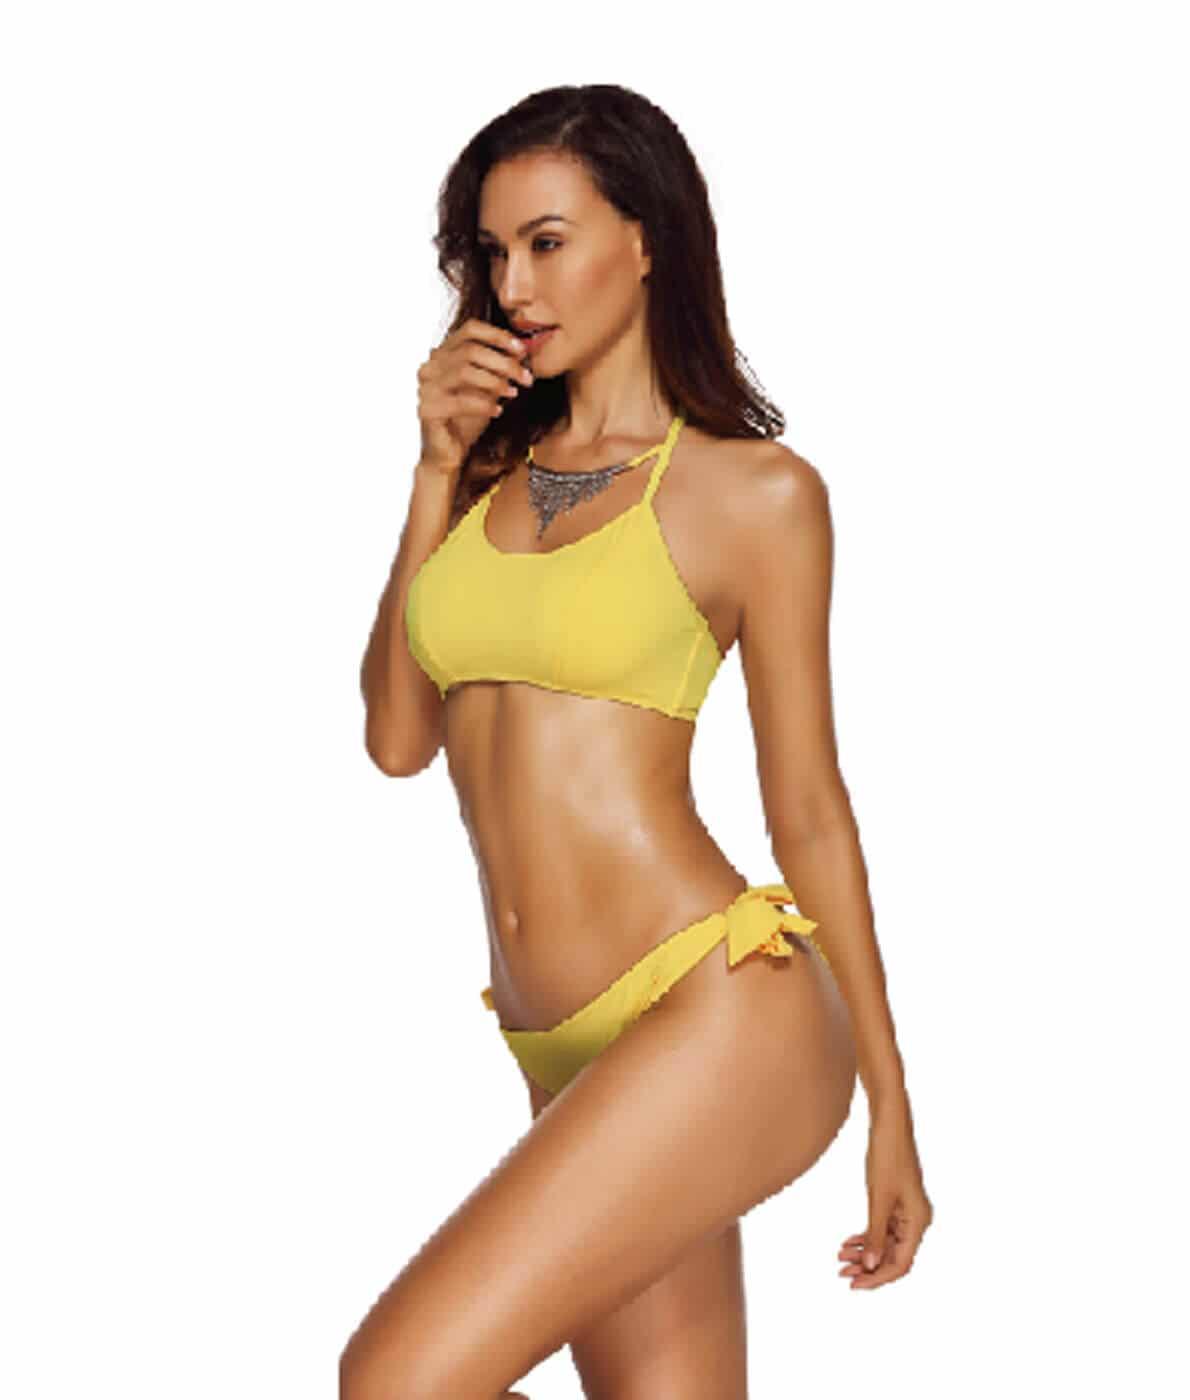 5c6557c0ca Csőtop bikini nyaklánccal - 14151 • Dorien